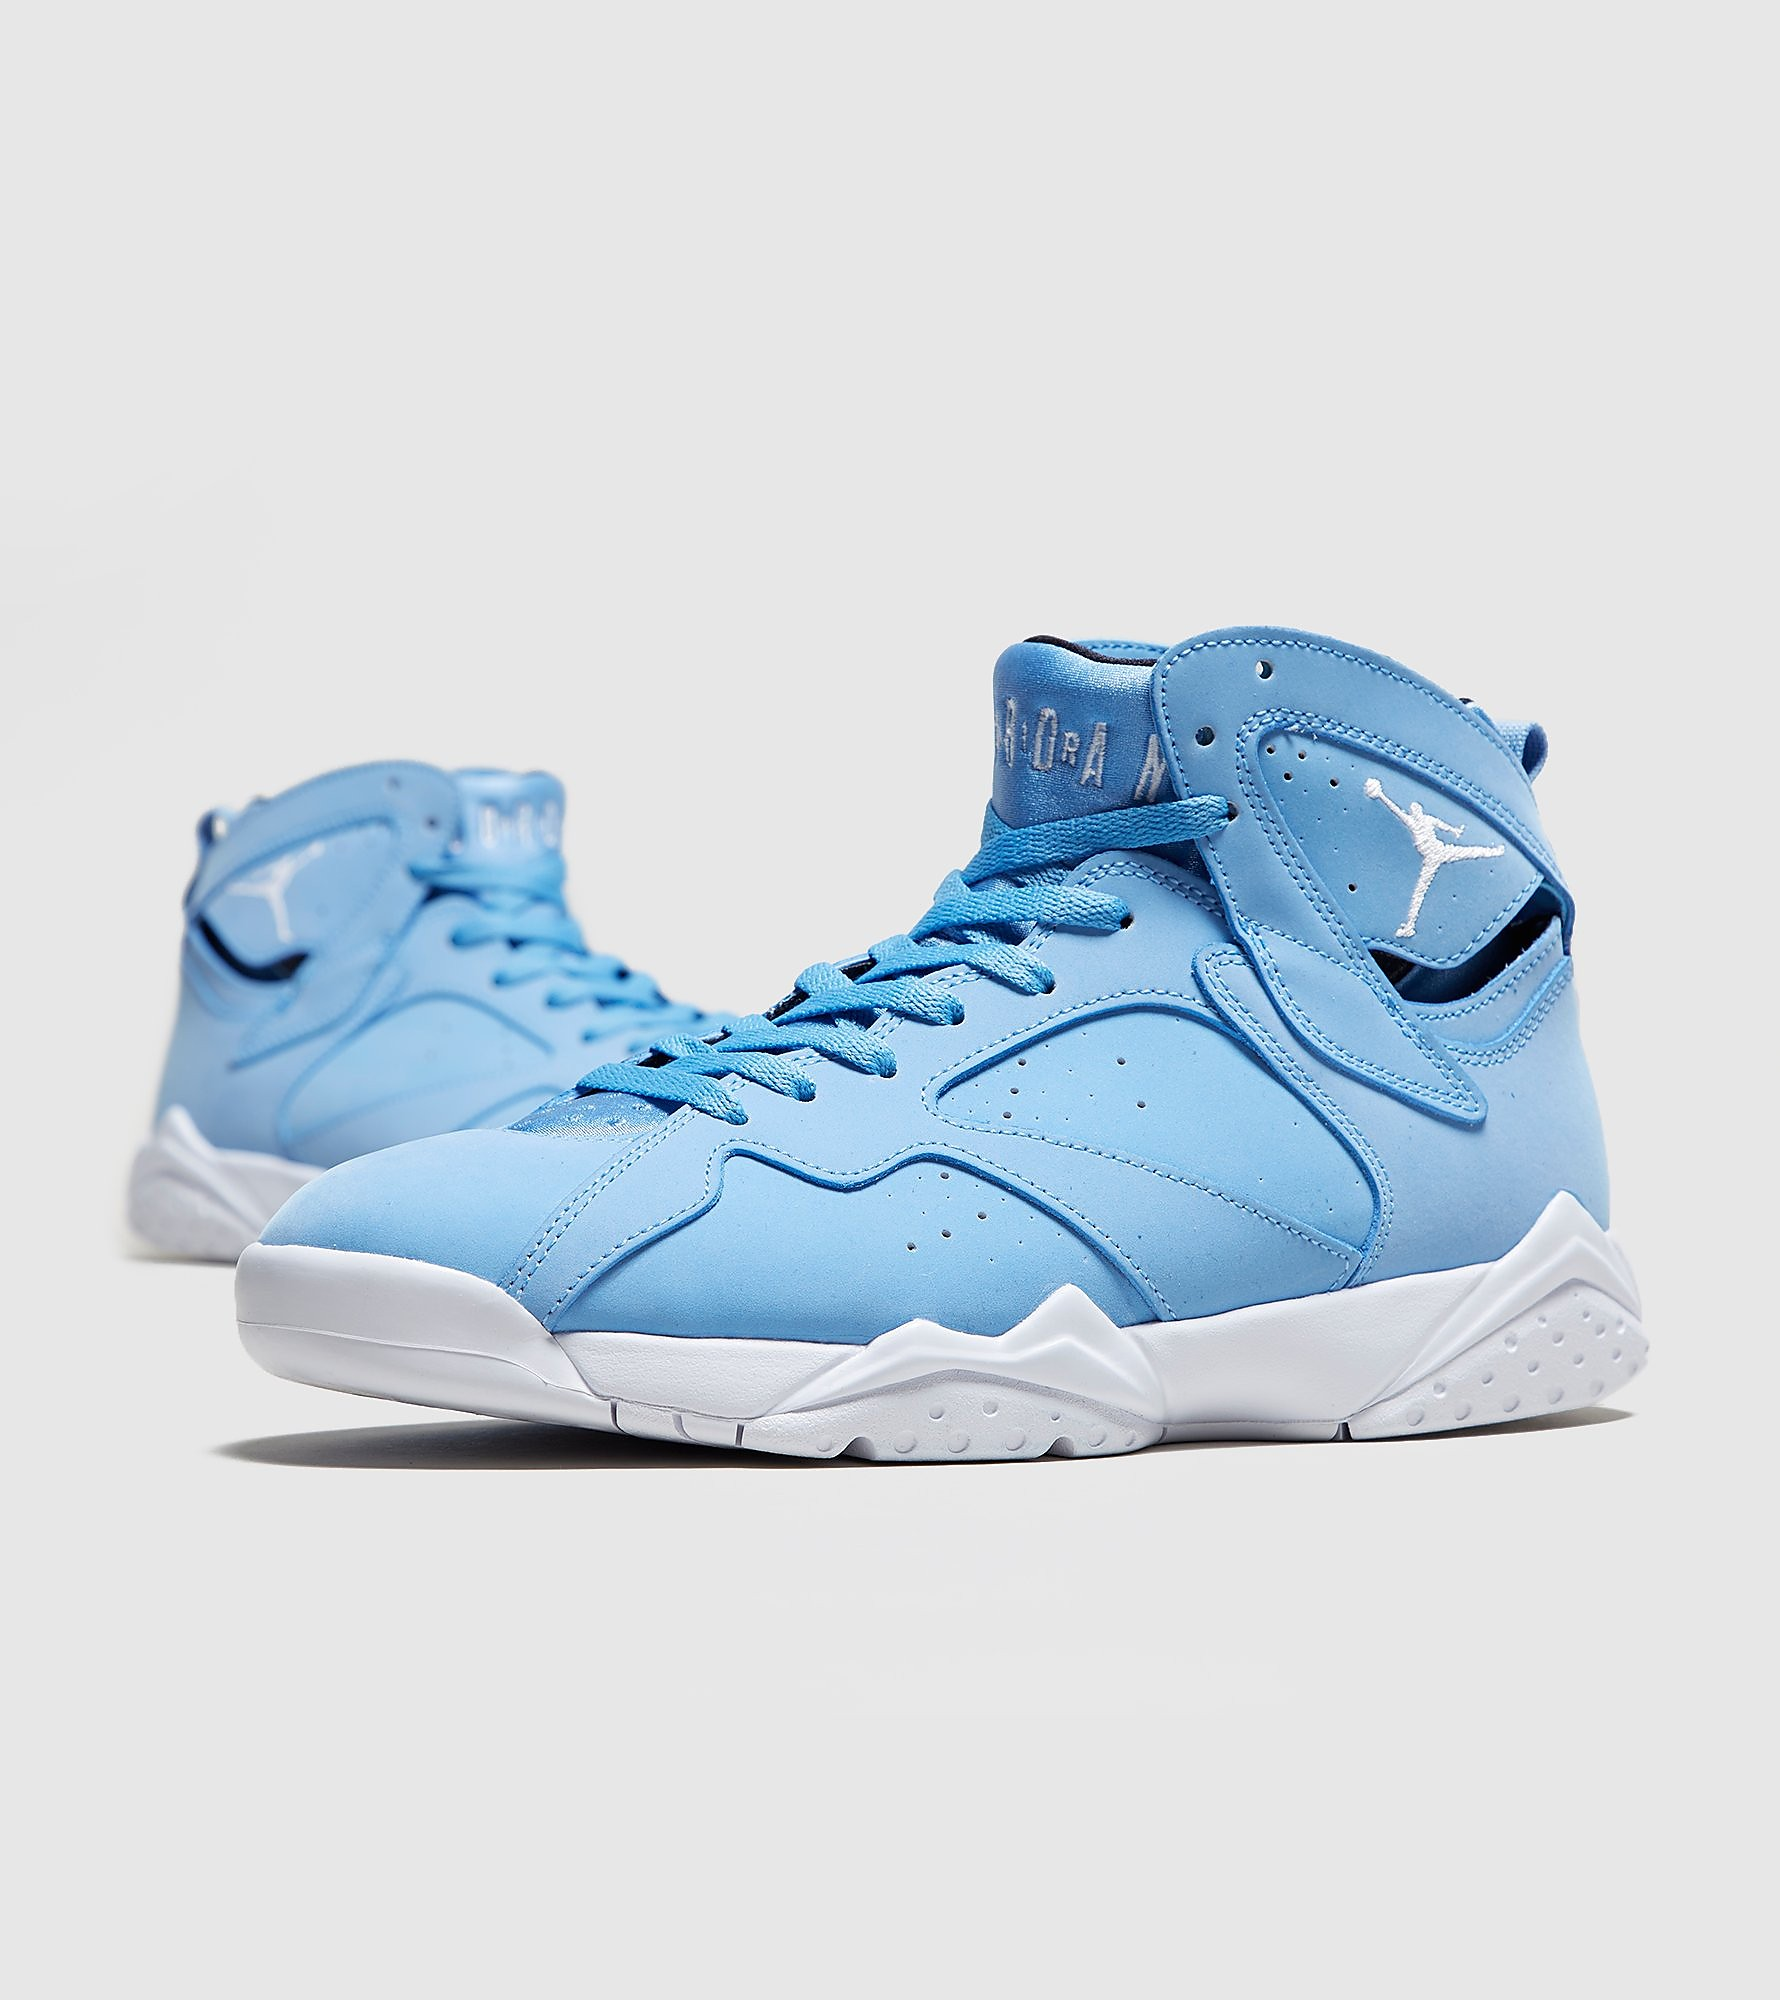 Jordan 7 Retro 'French Blue'